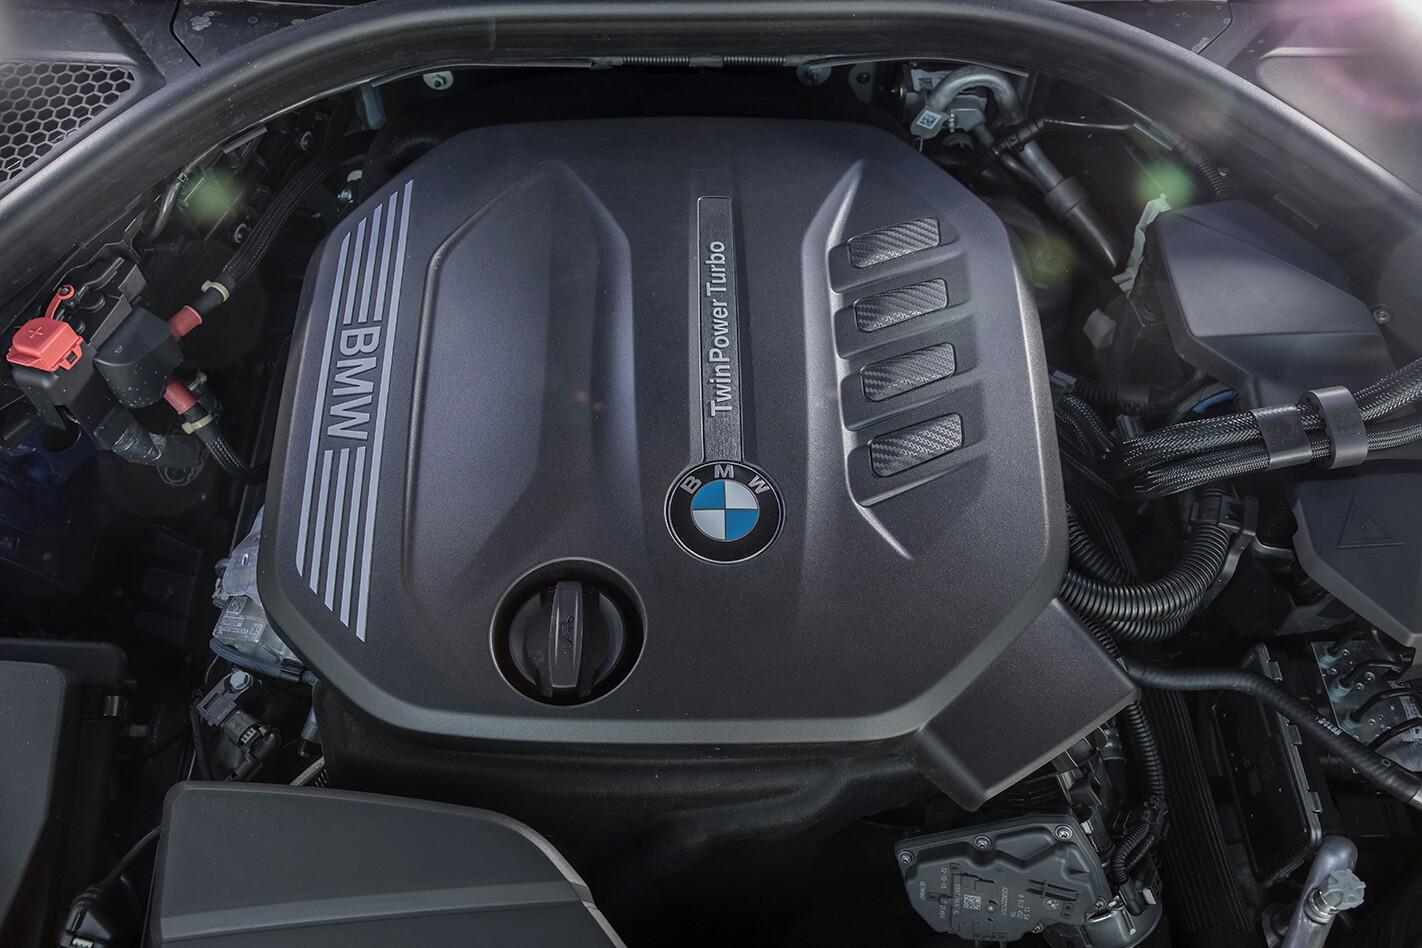 BMW 320d engine